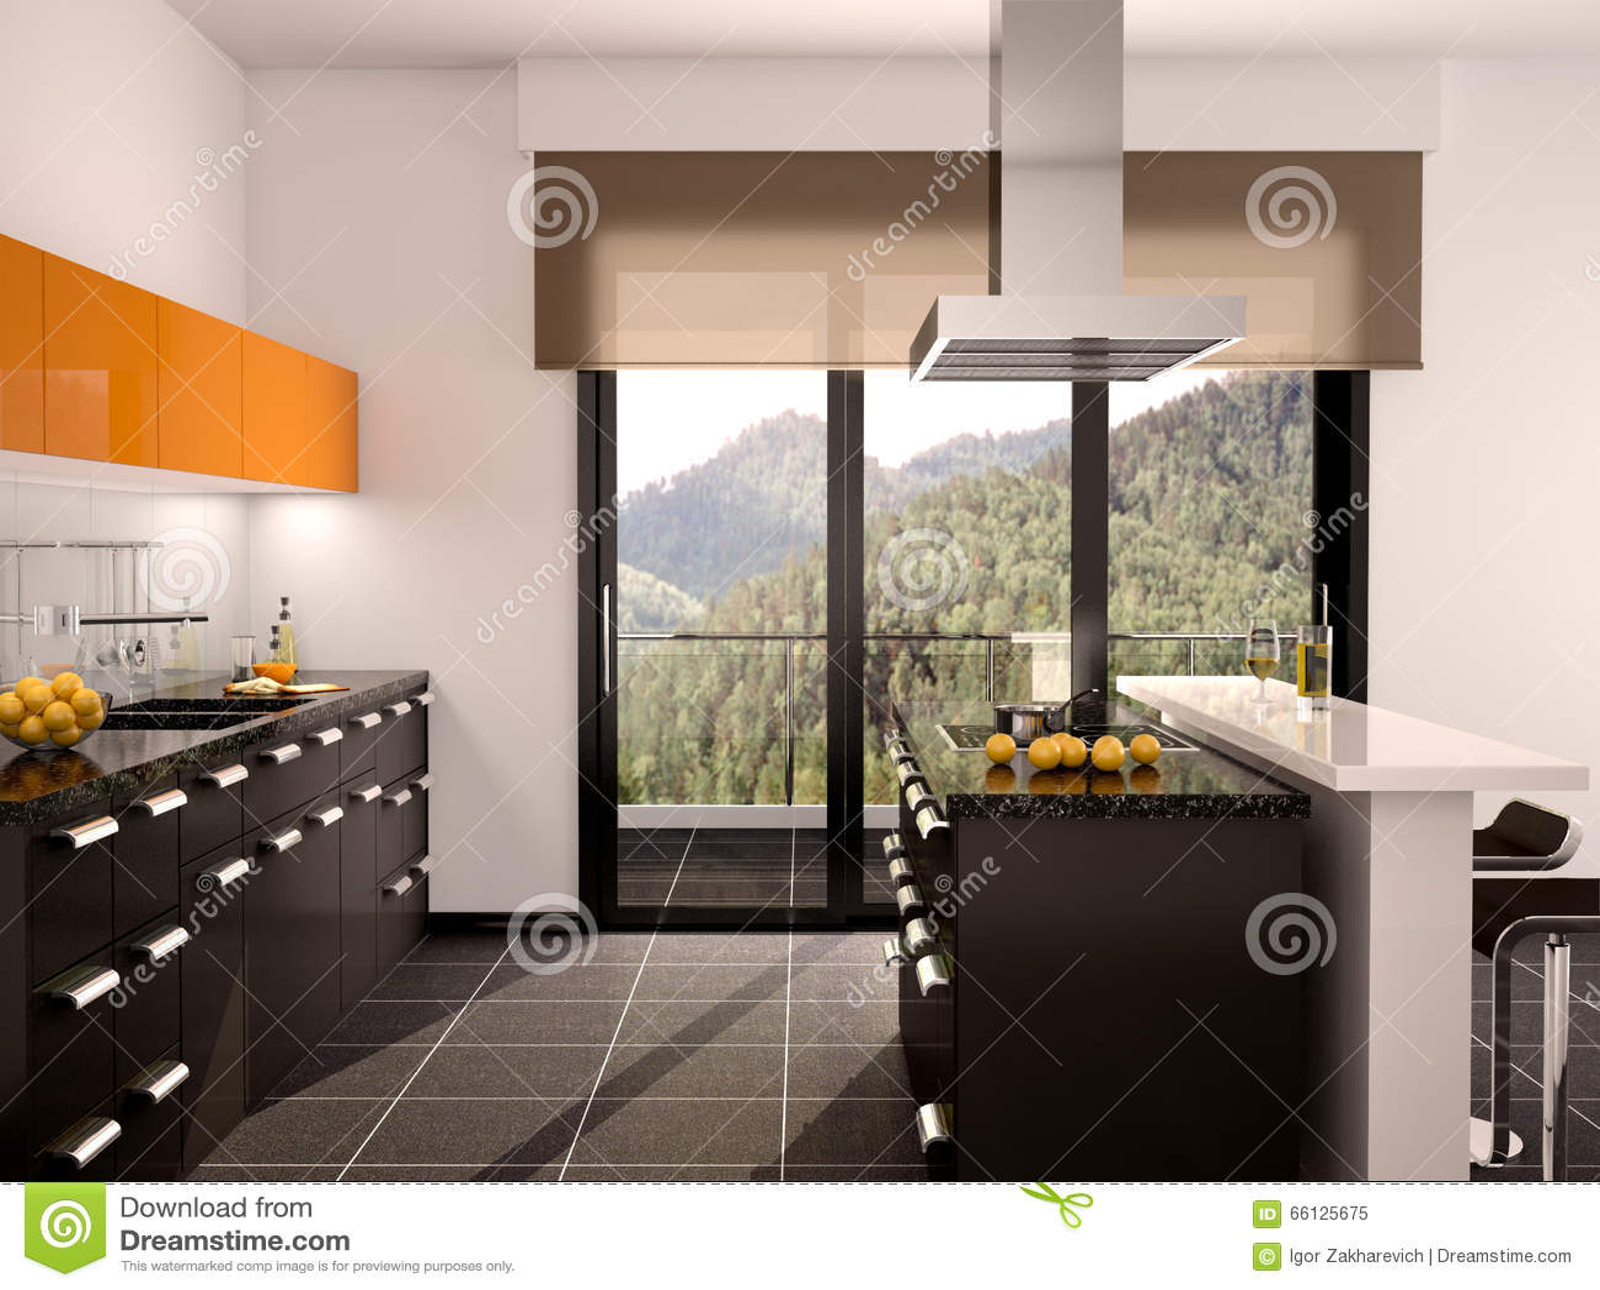 Illustration Of Modern Black And Orange Kitchen Interior